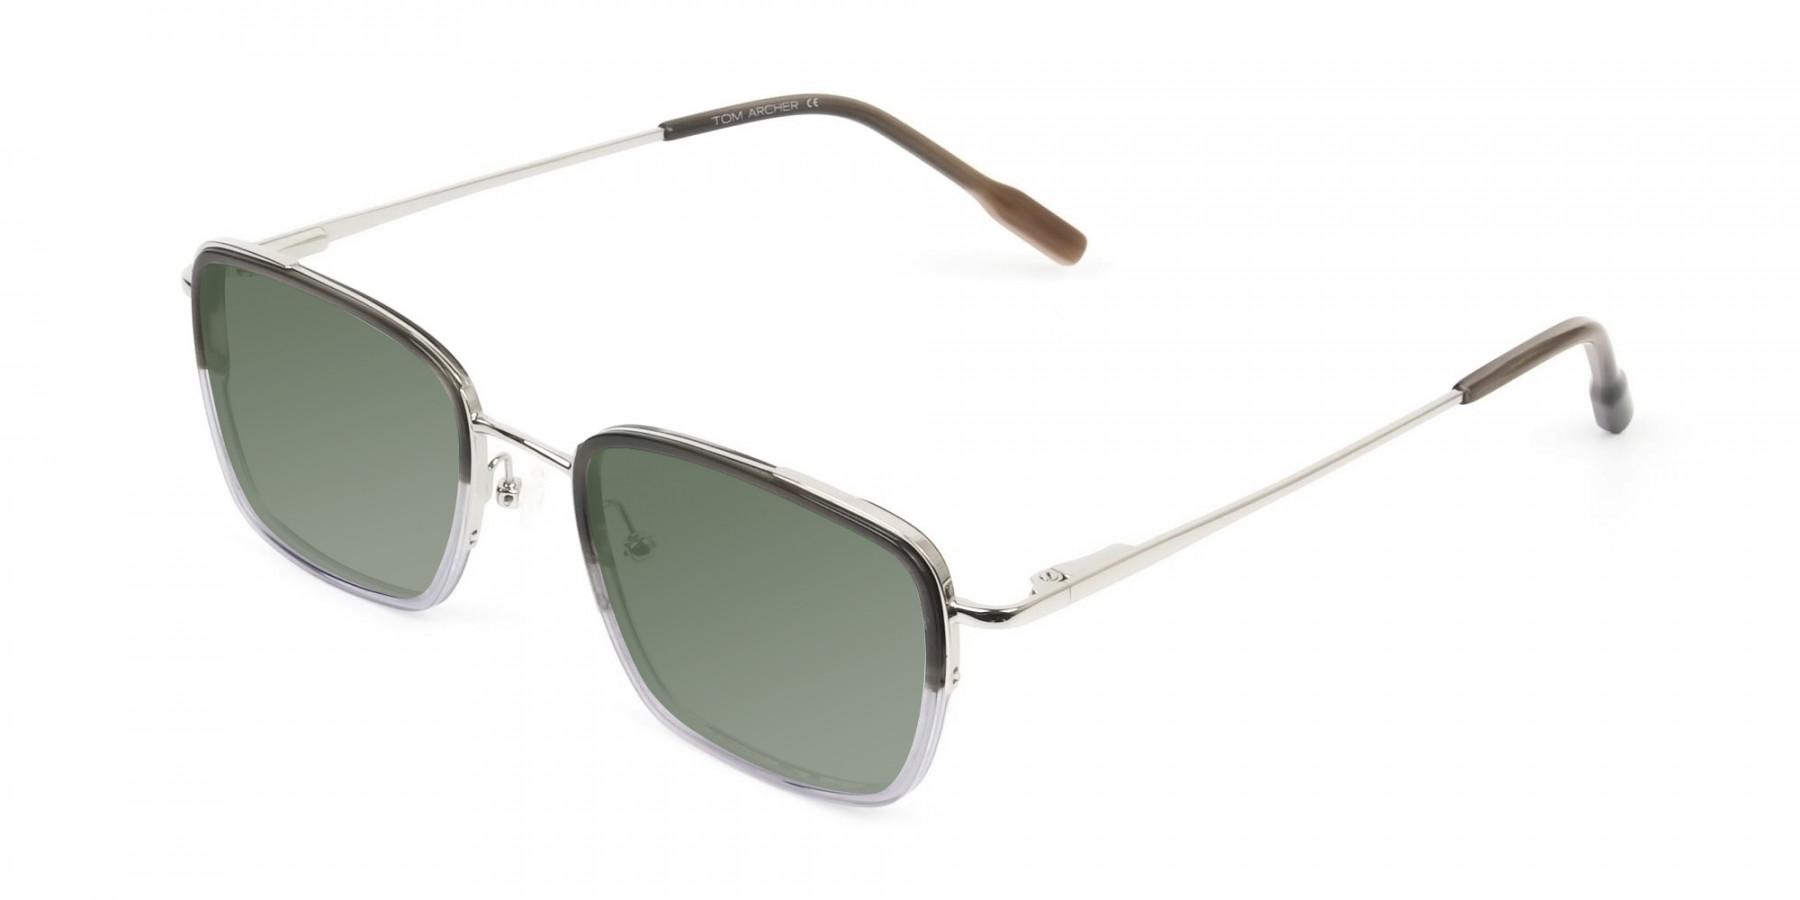 Green Tinted Charcoal Wayfarer Sunglasses - 3